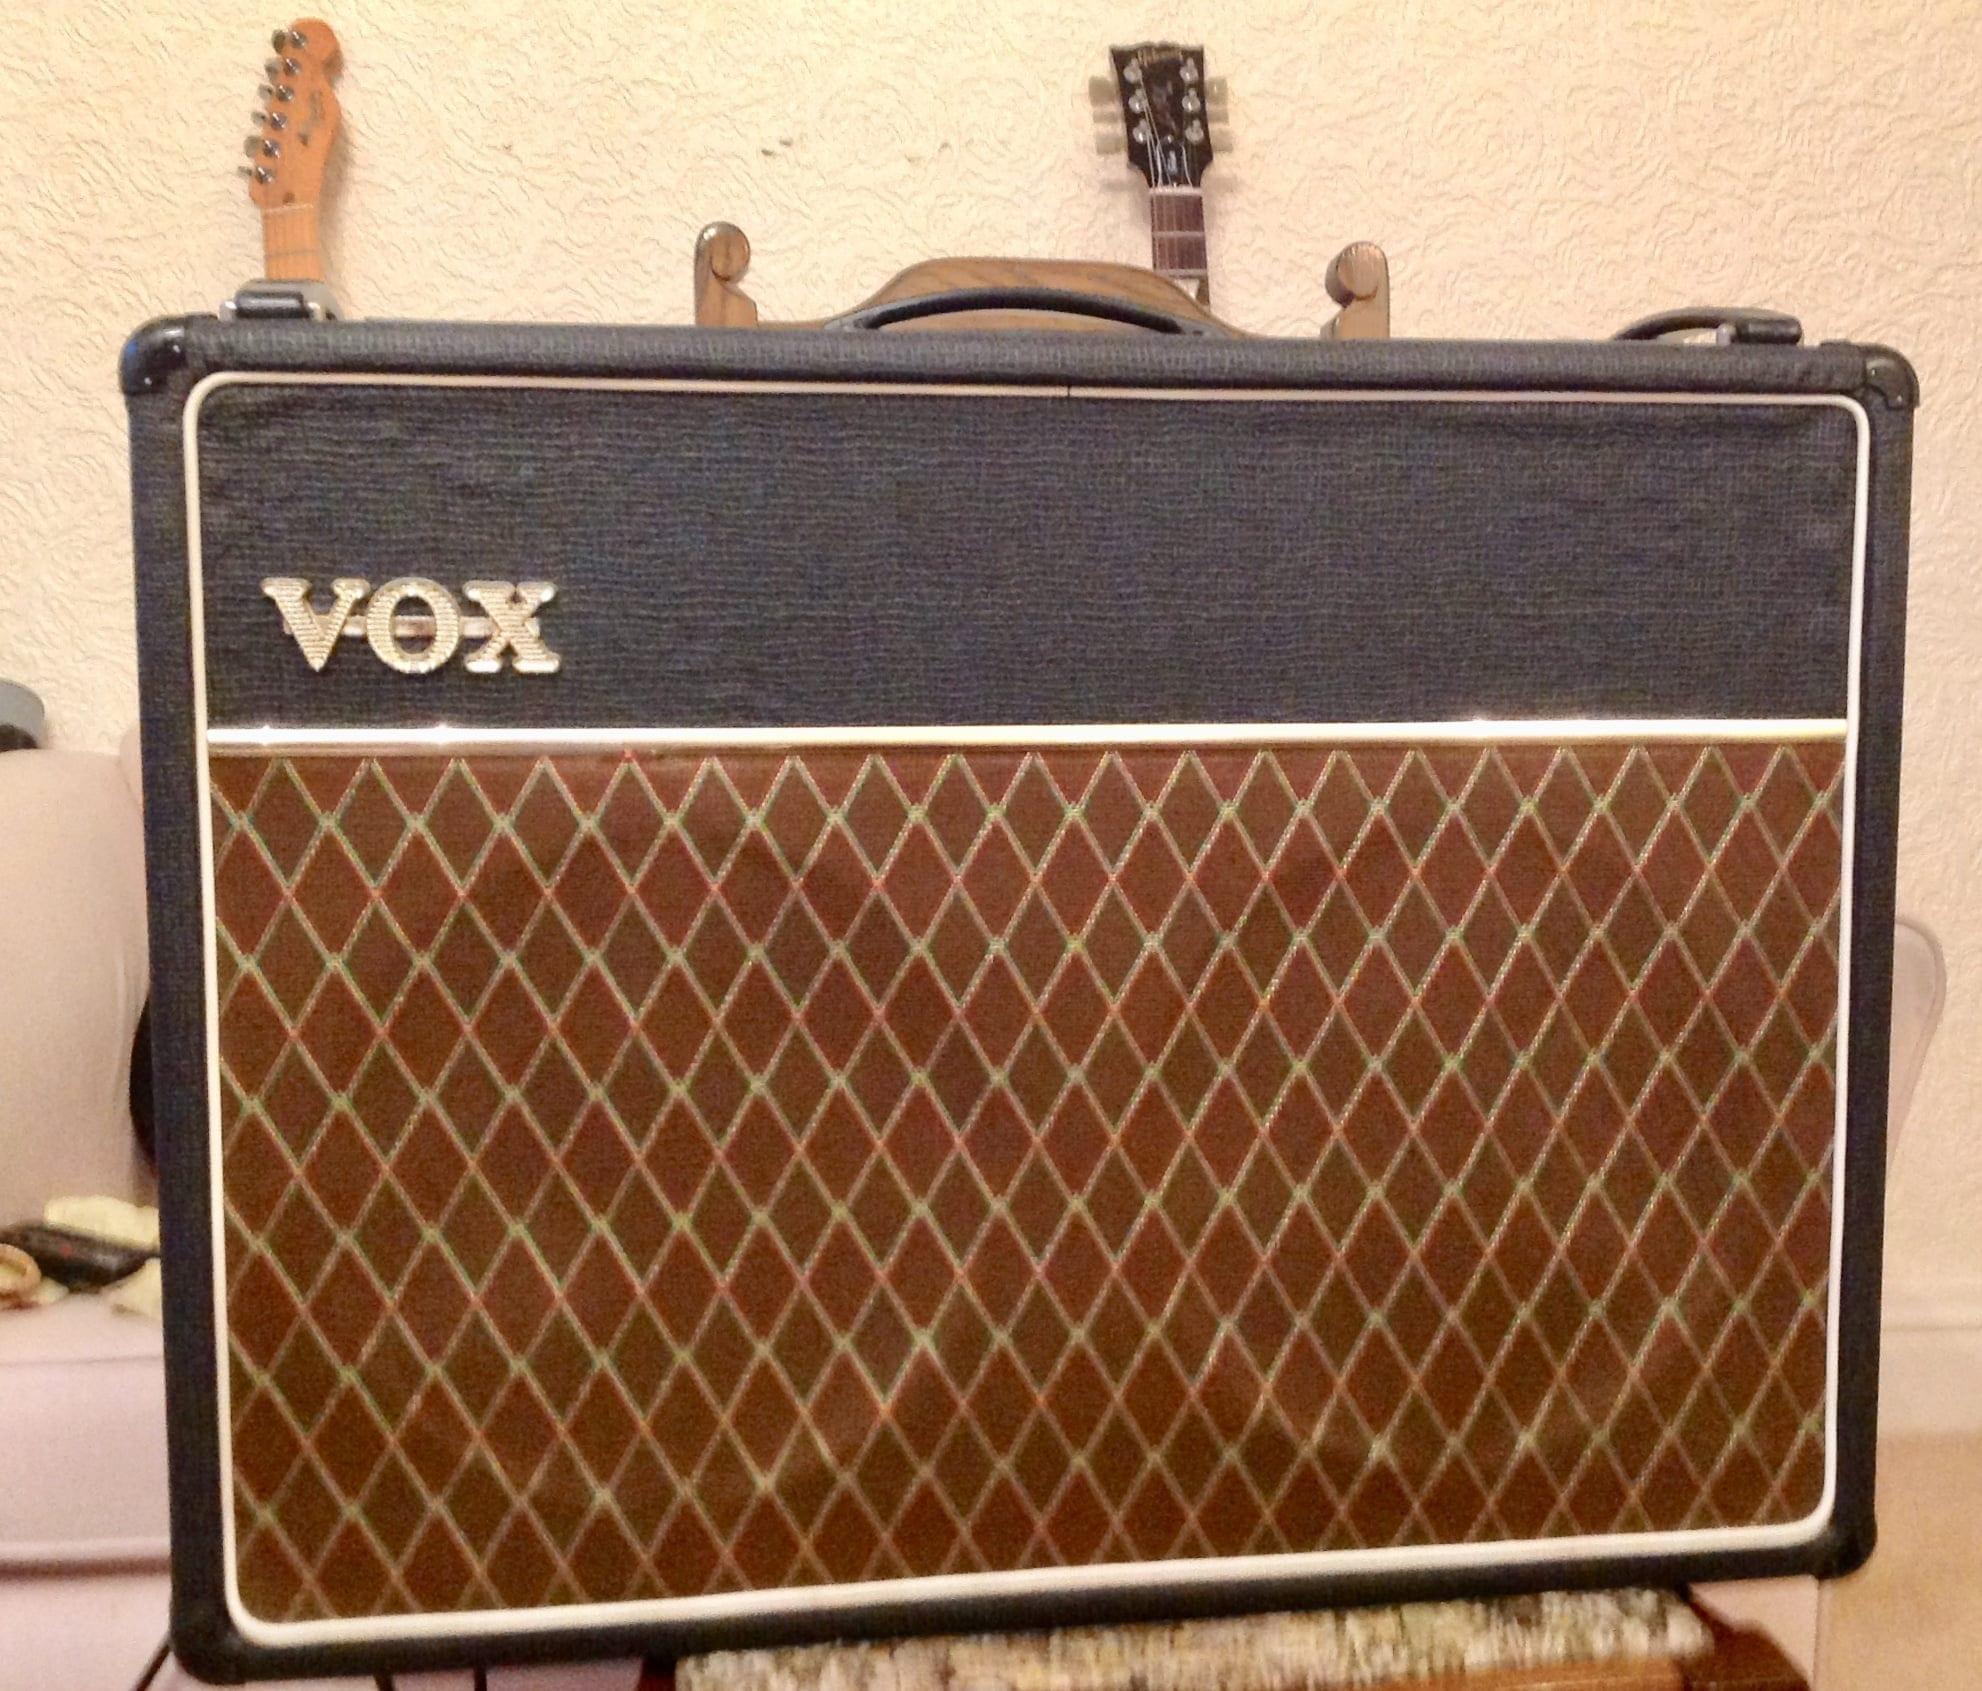 Vox AC30/6 1964 front image